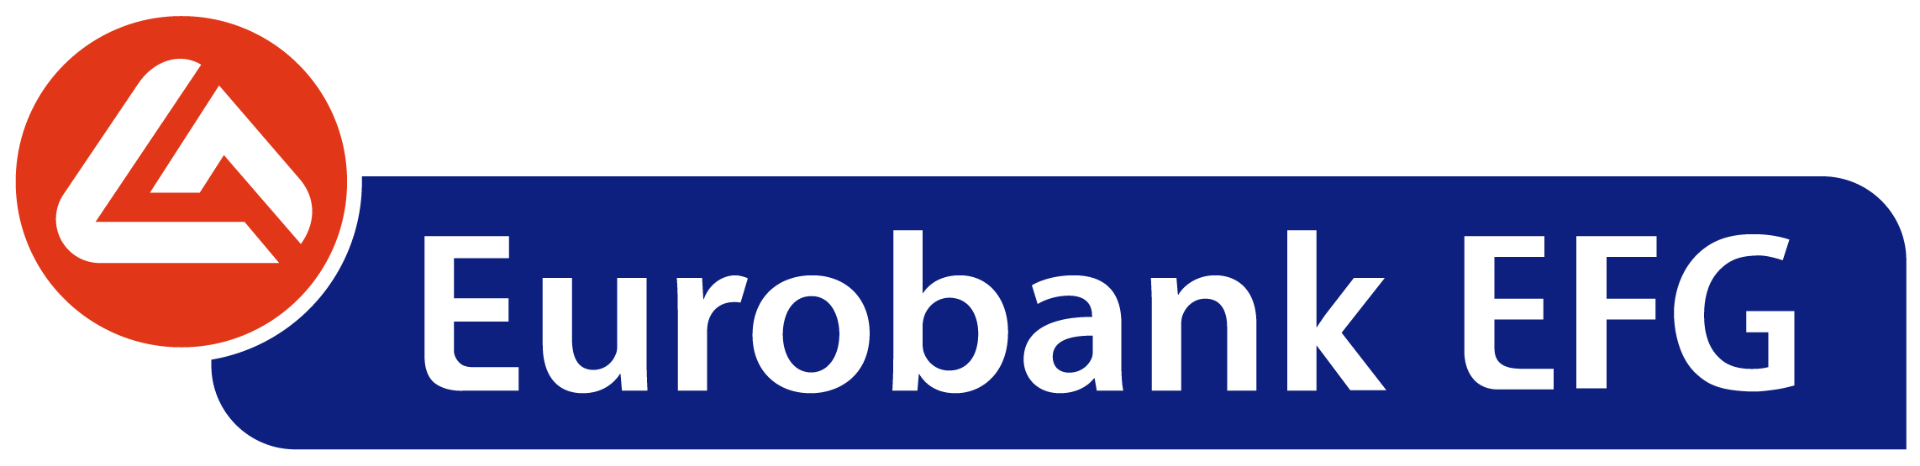 S-BATH - EUROBANK